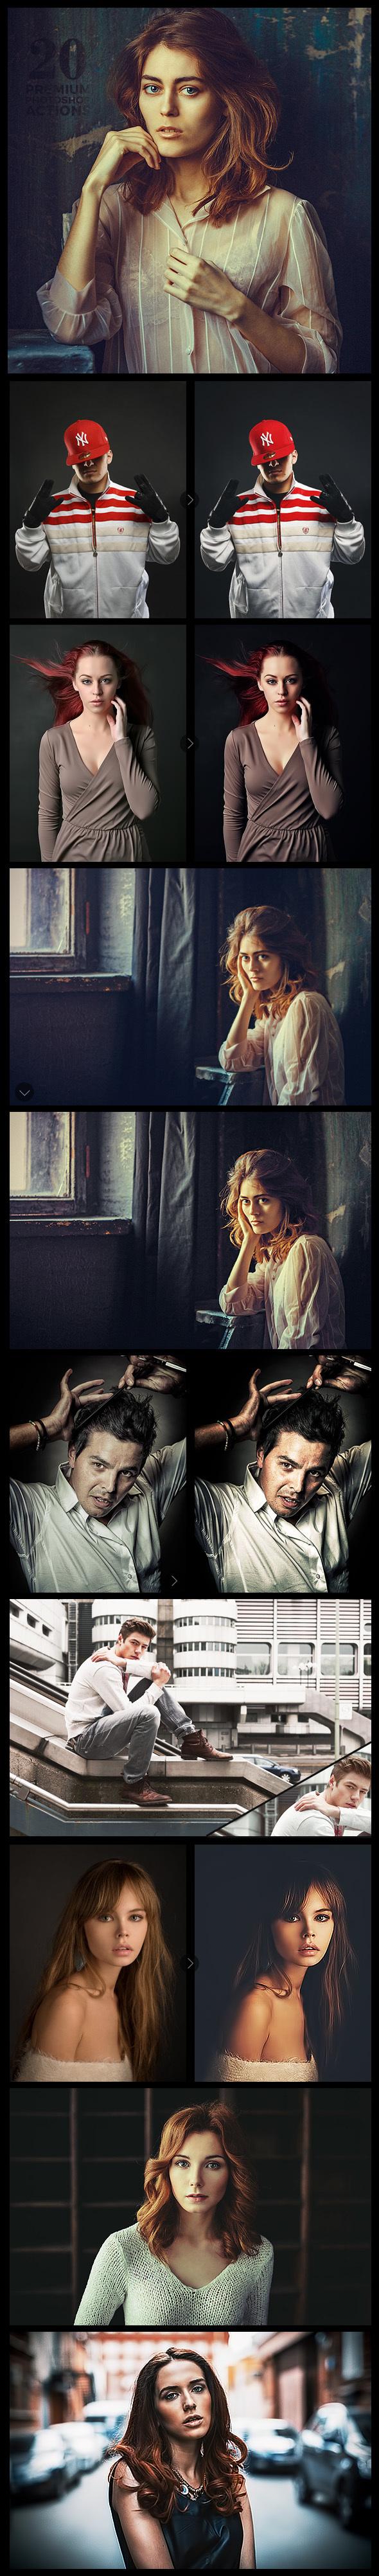 20 Premium Photoshop Actions Set - Photo Effects Actions